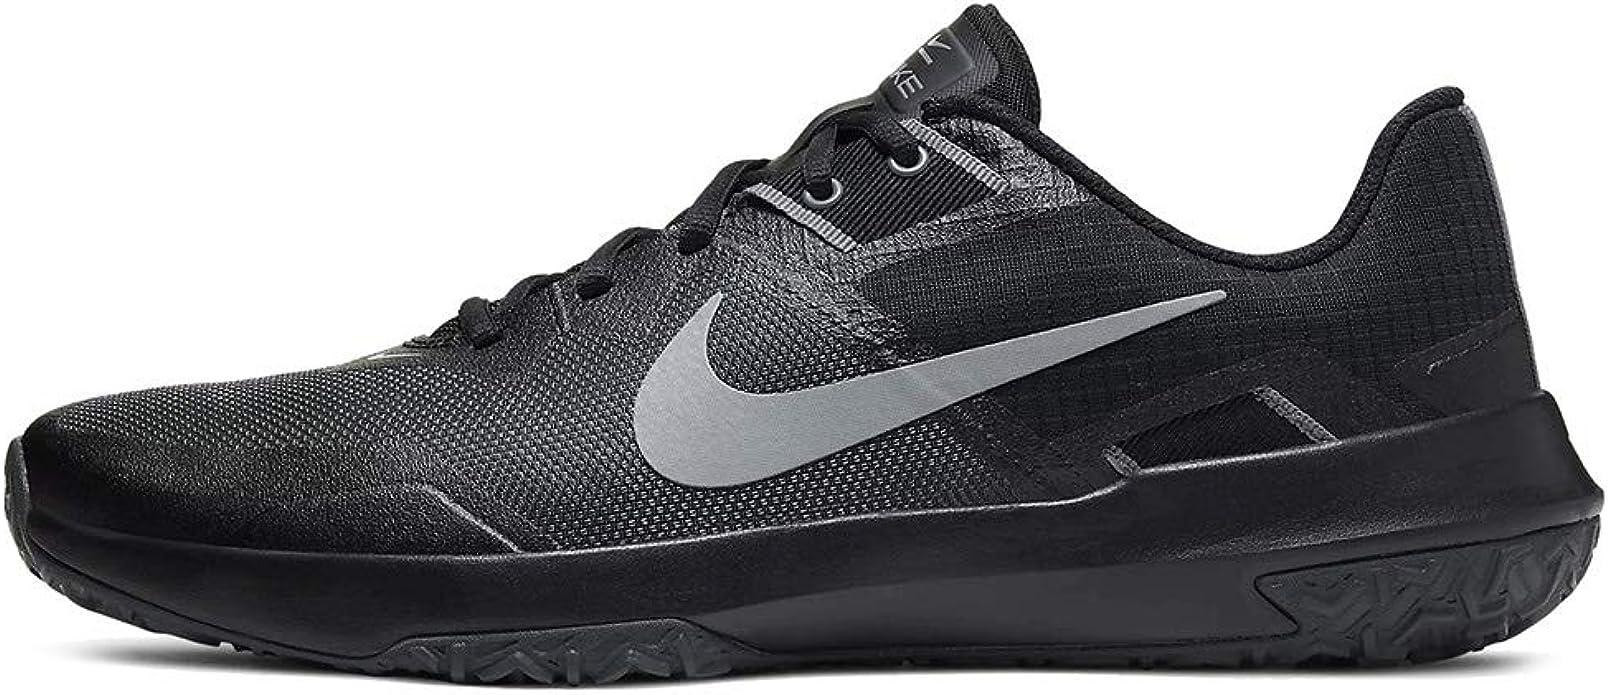 Nike Varsity Compete Tr 3 Mens Training